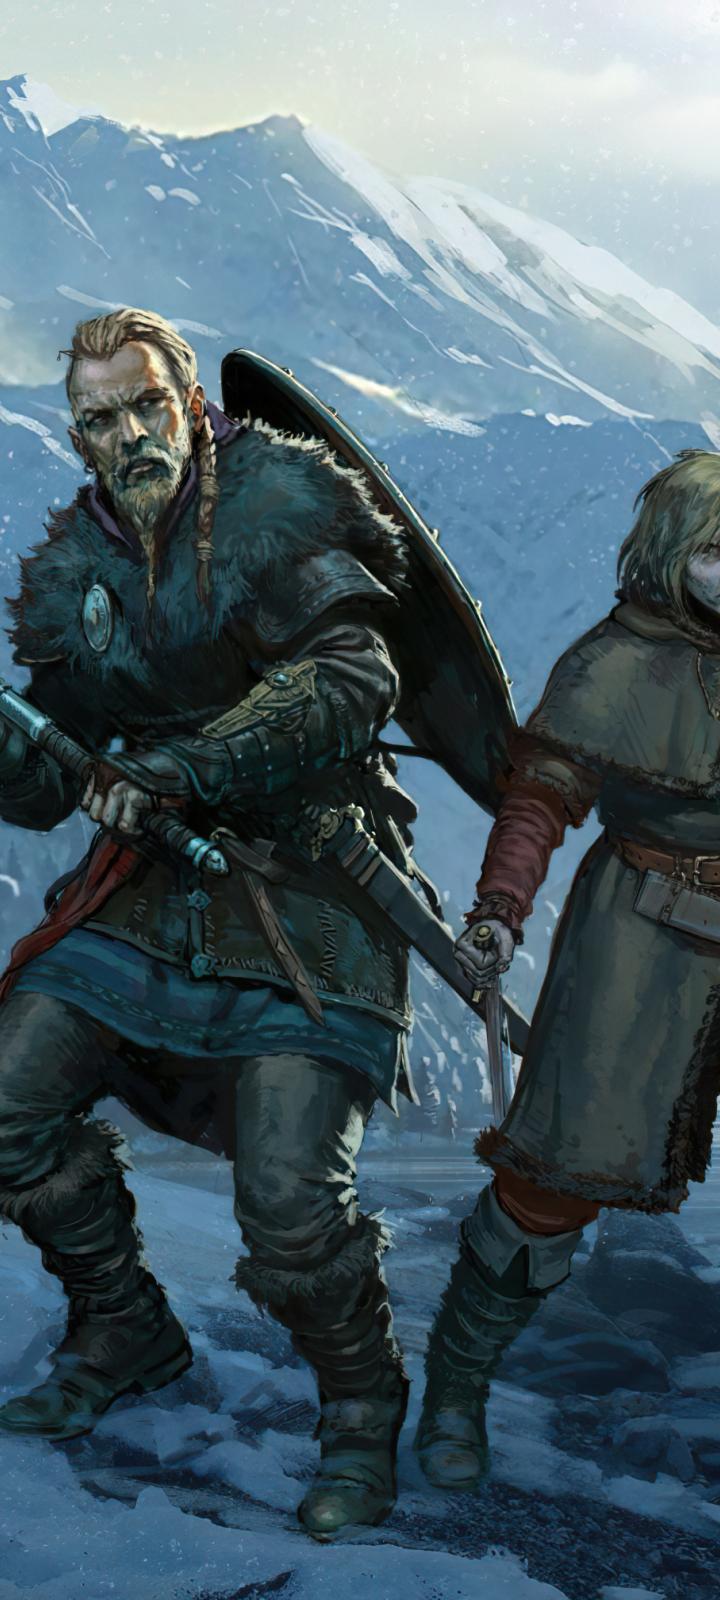 720x1600 Vinland Saga Assassins Creed Valhalla 720x1600 ...